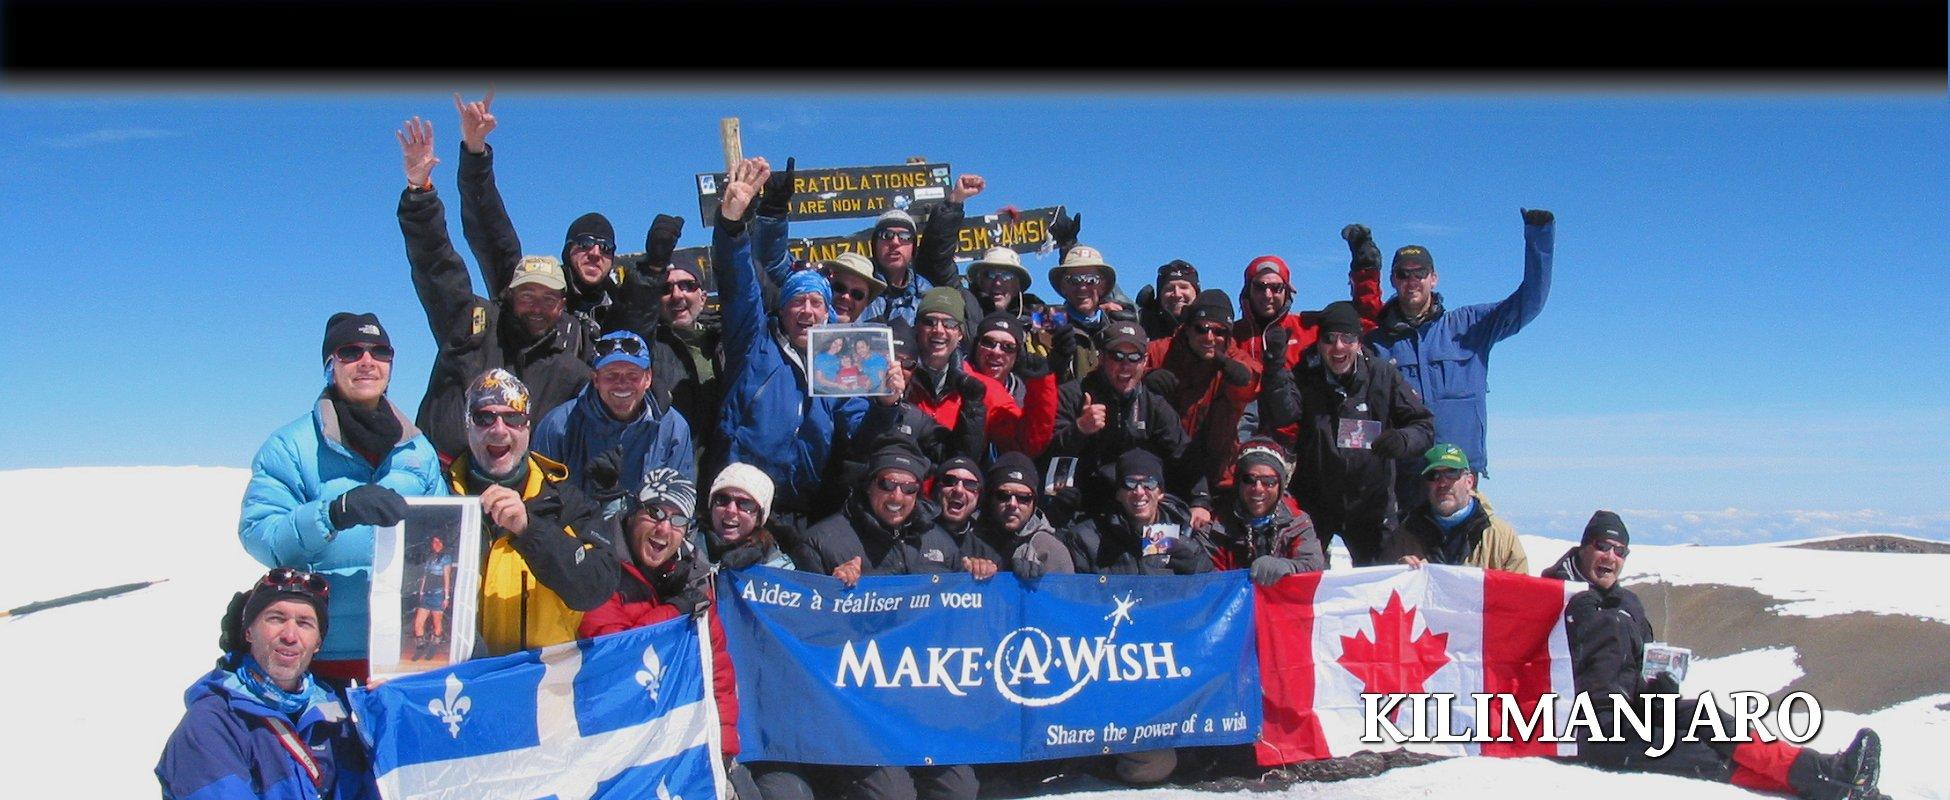 Tusker - Kilimanjaro Charity Climbs